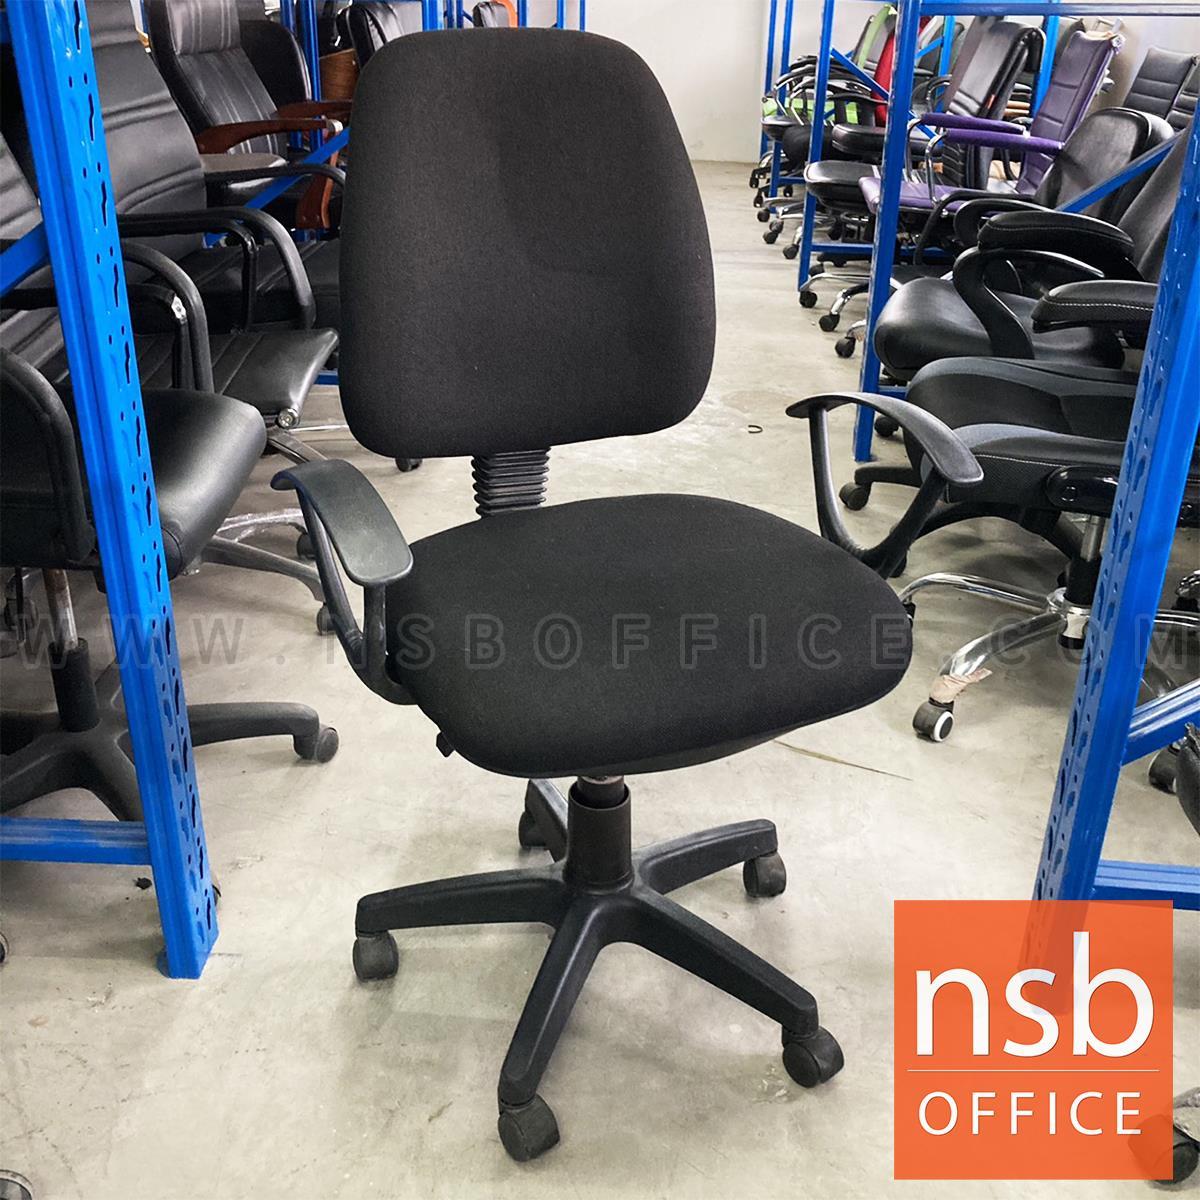 L02A384:เก้าอี้สำนักงาน   มีก้อนโยก ขาพลาสติก